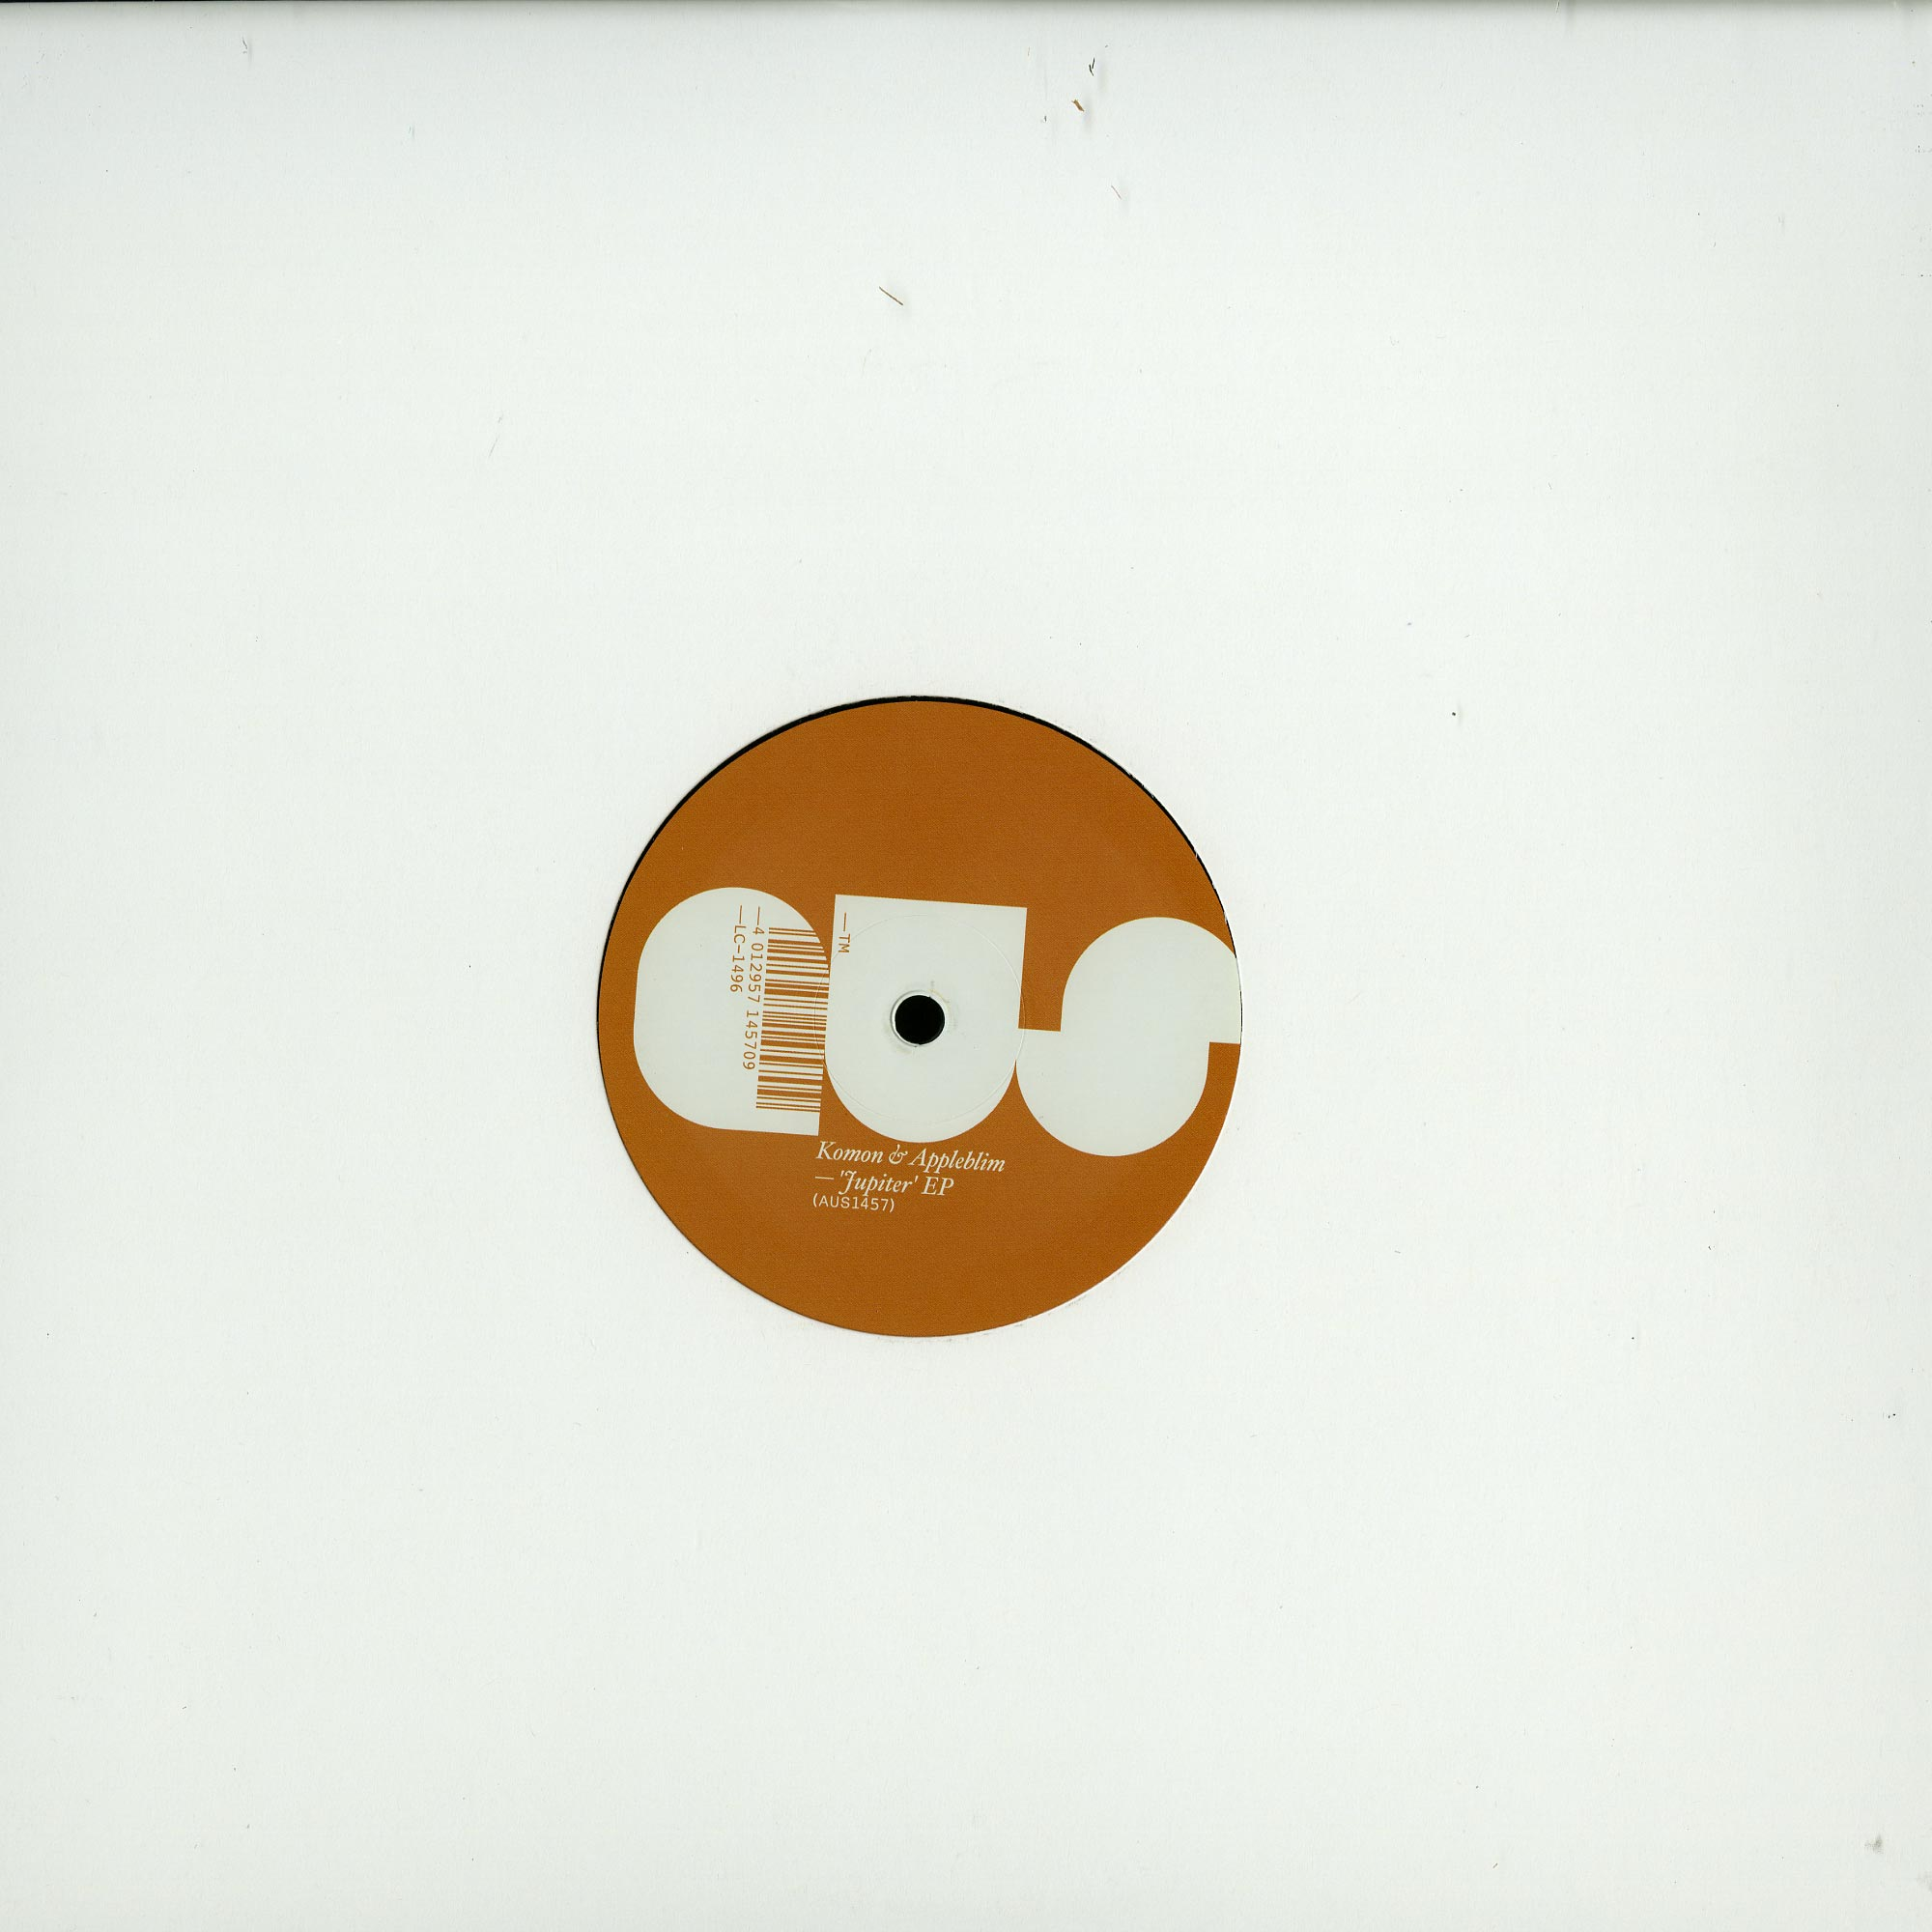 Komon & Appleblim - JUPITER